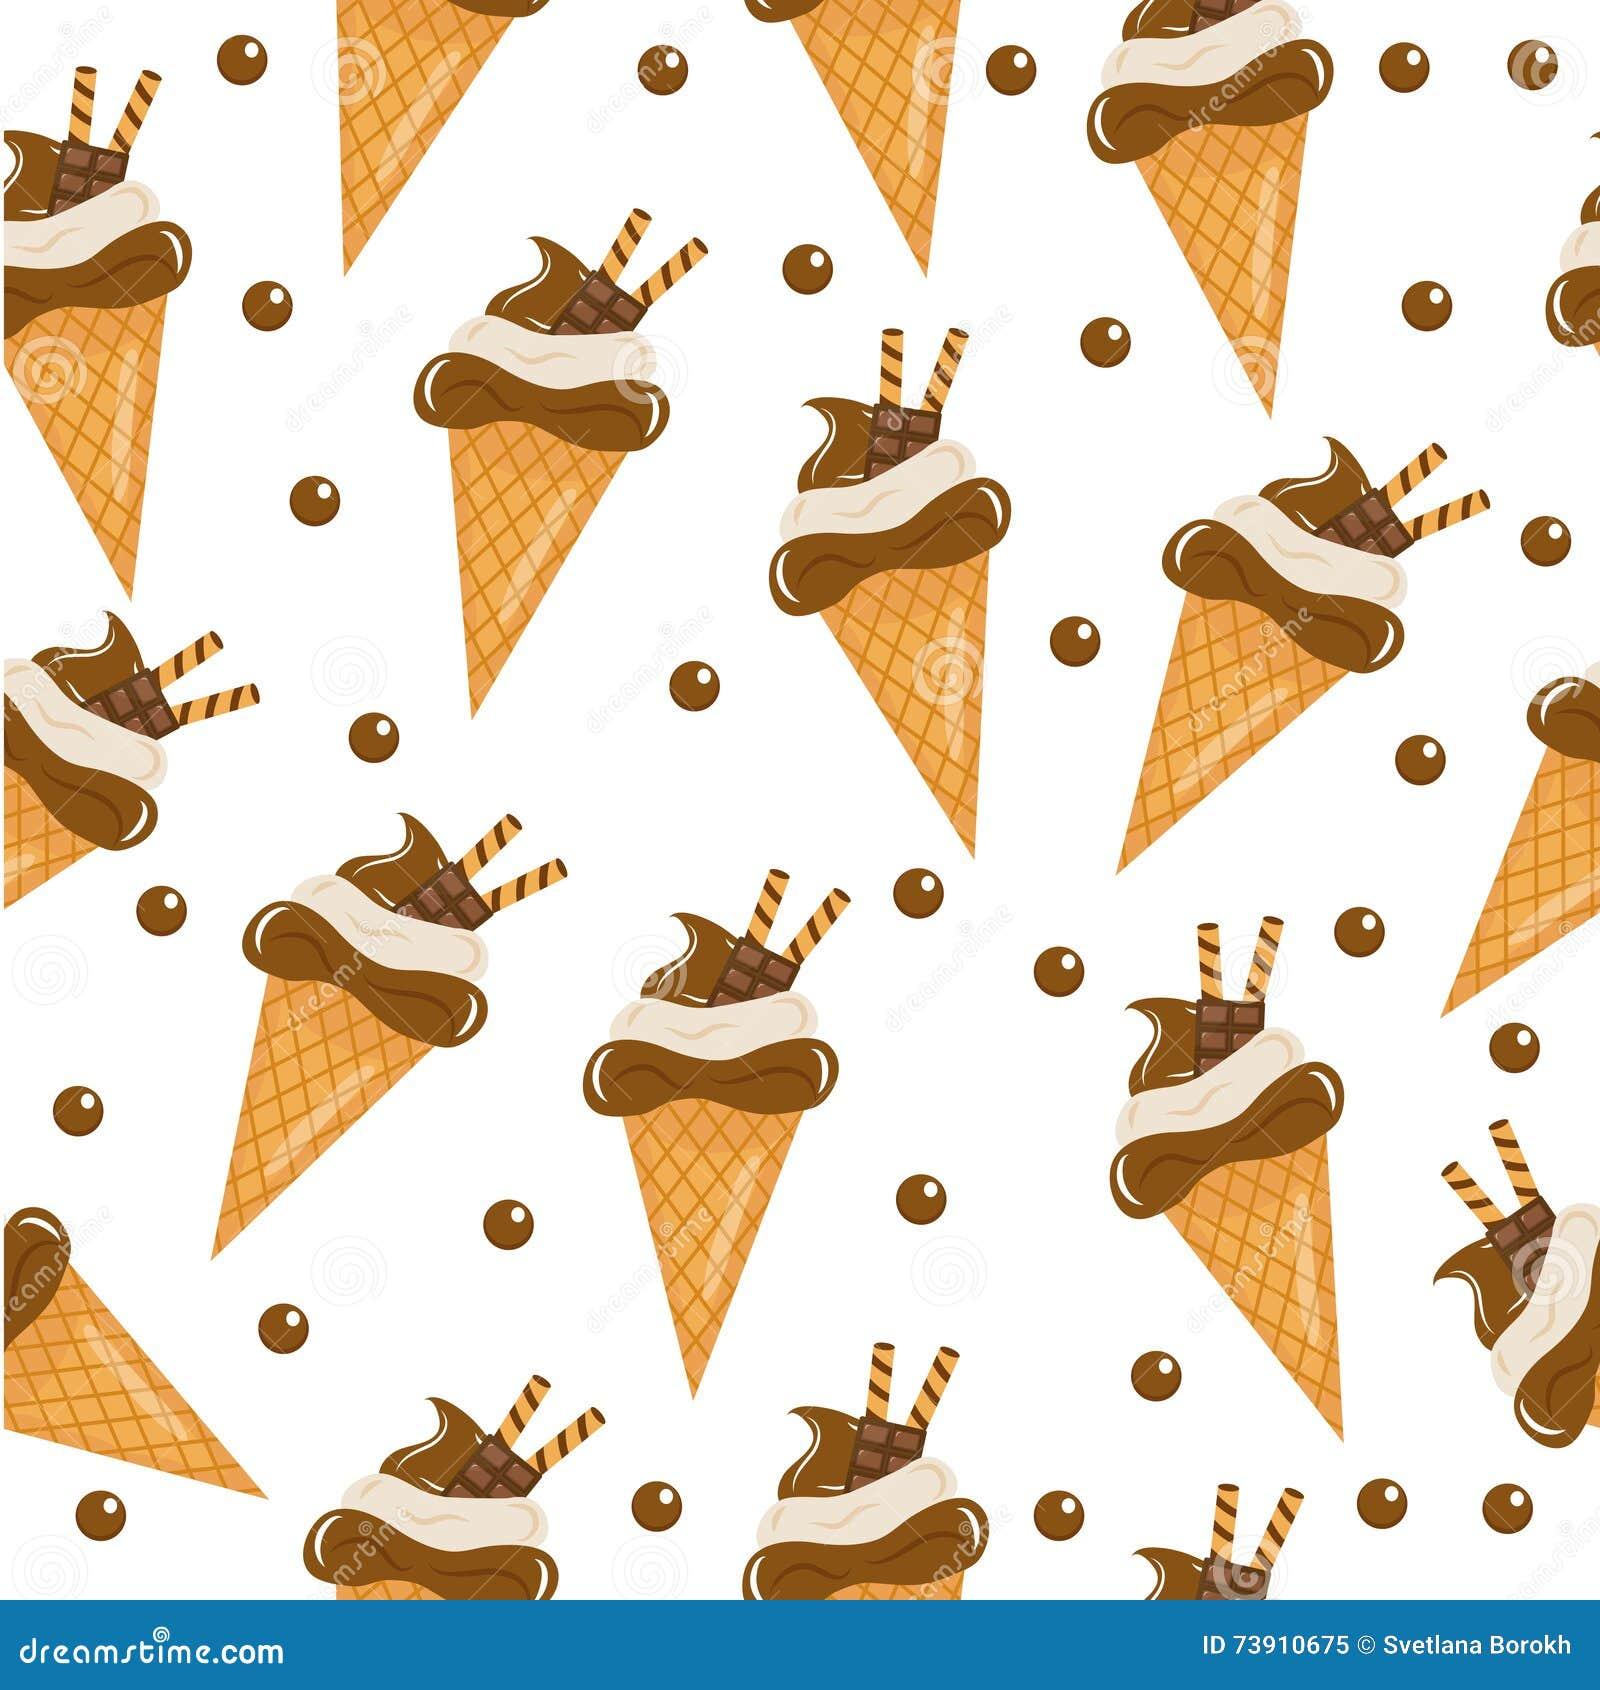 Ice Cream Cone Wallpaper: Chocolate Ice Cream Seamless Texture. Ice Cream Cone